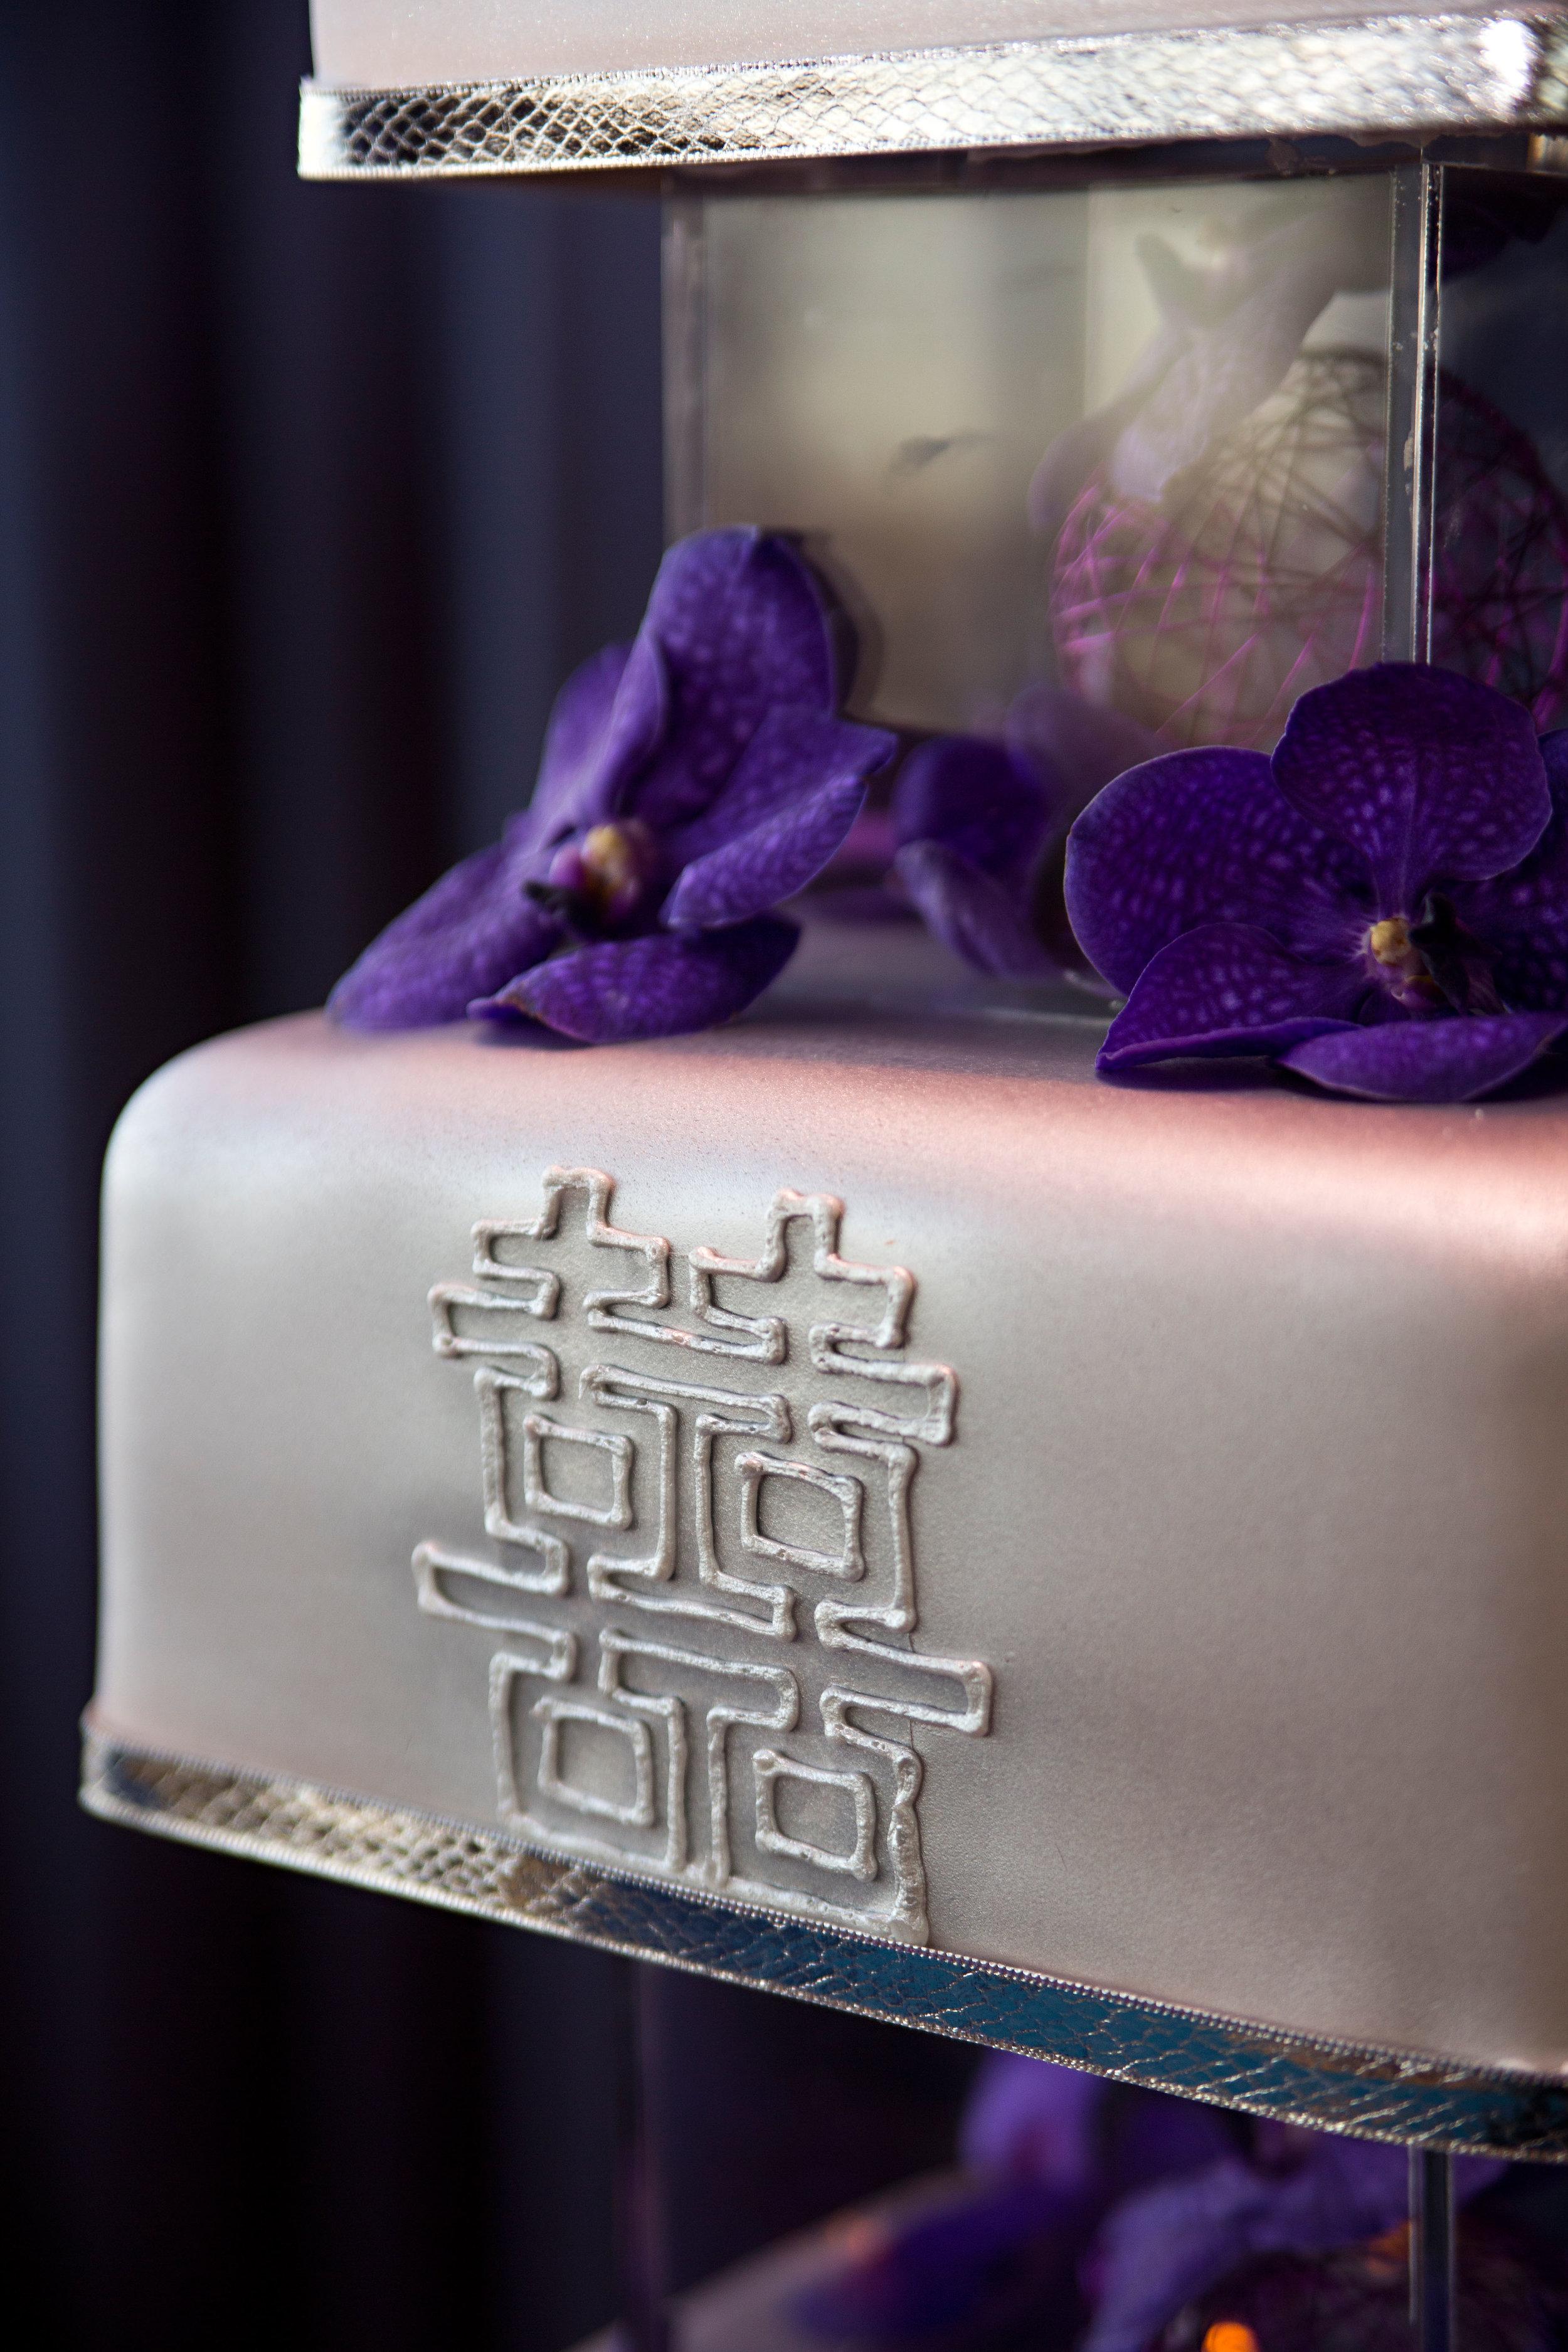 32 silver wedding cake unique wedding cake three tier wedding cake silver and purple wedding cake.jpg